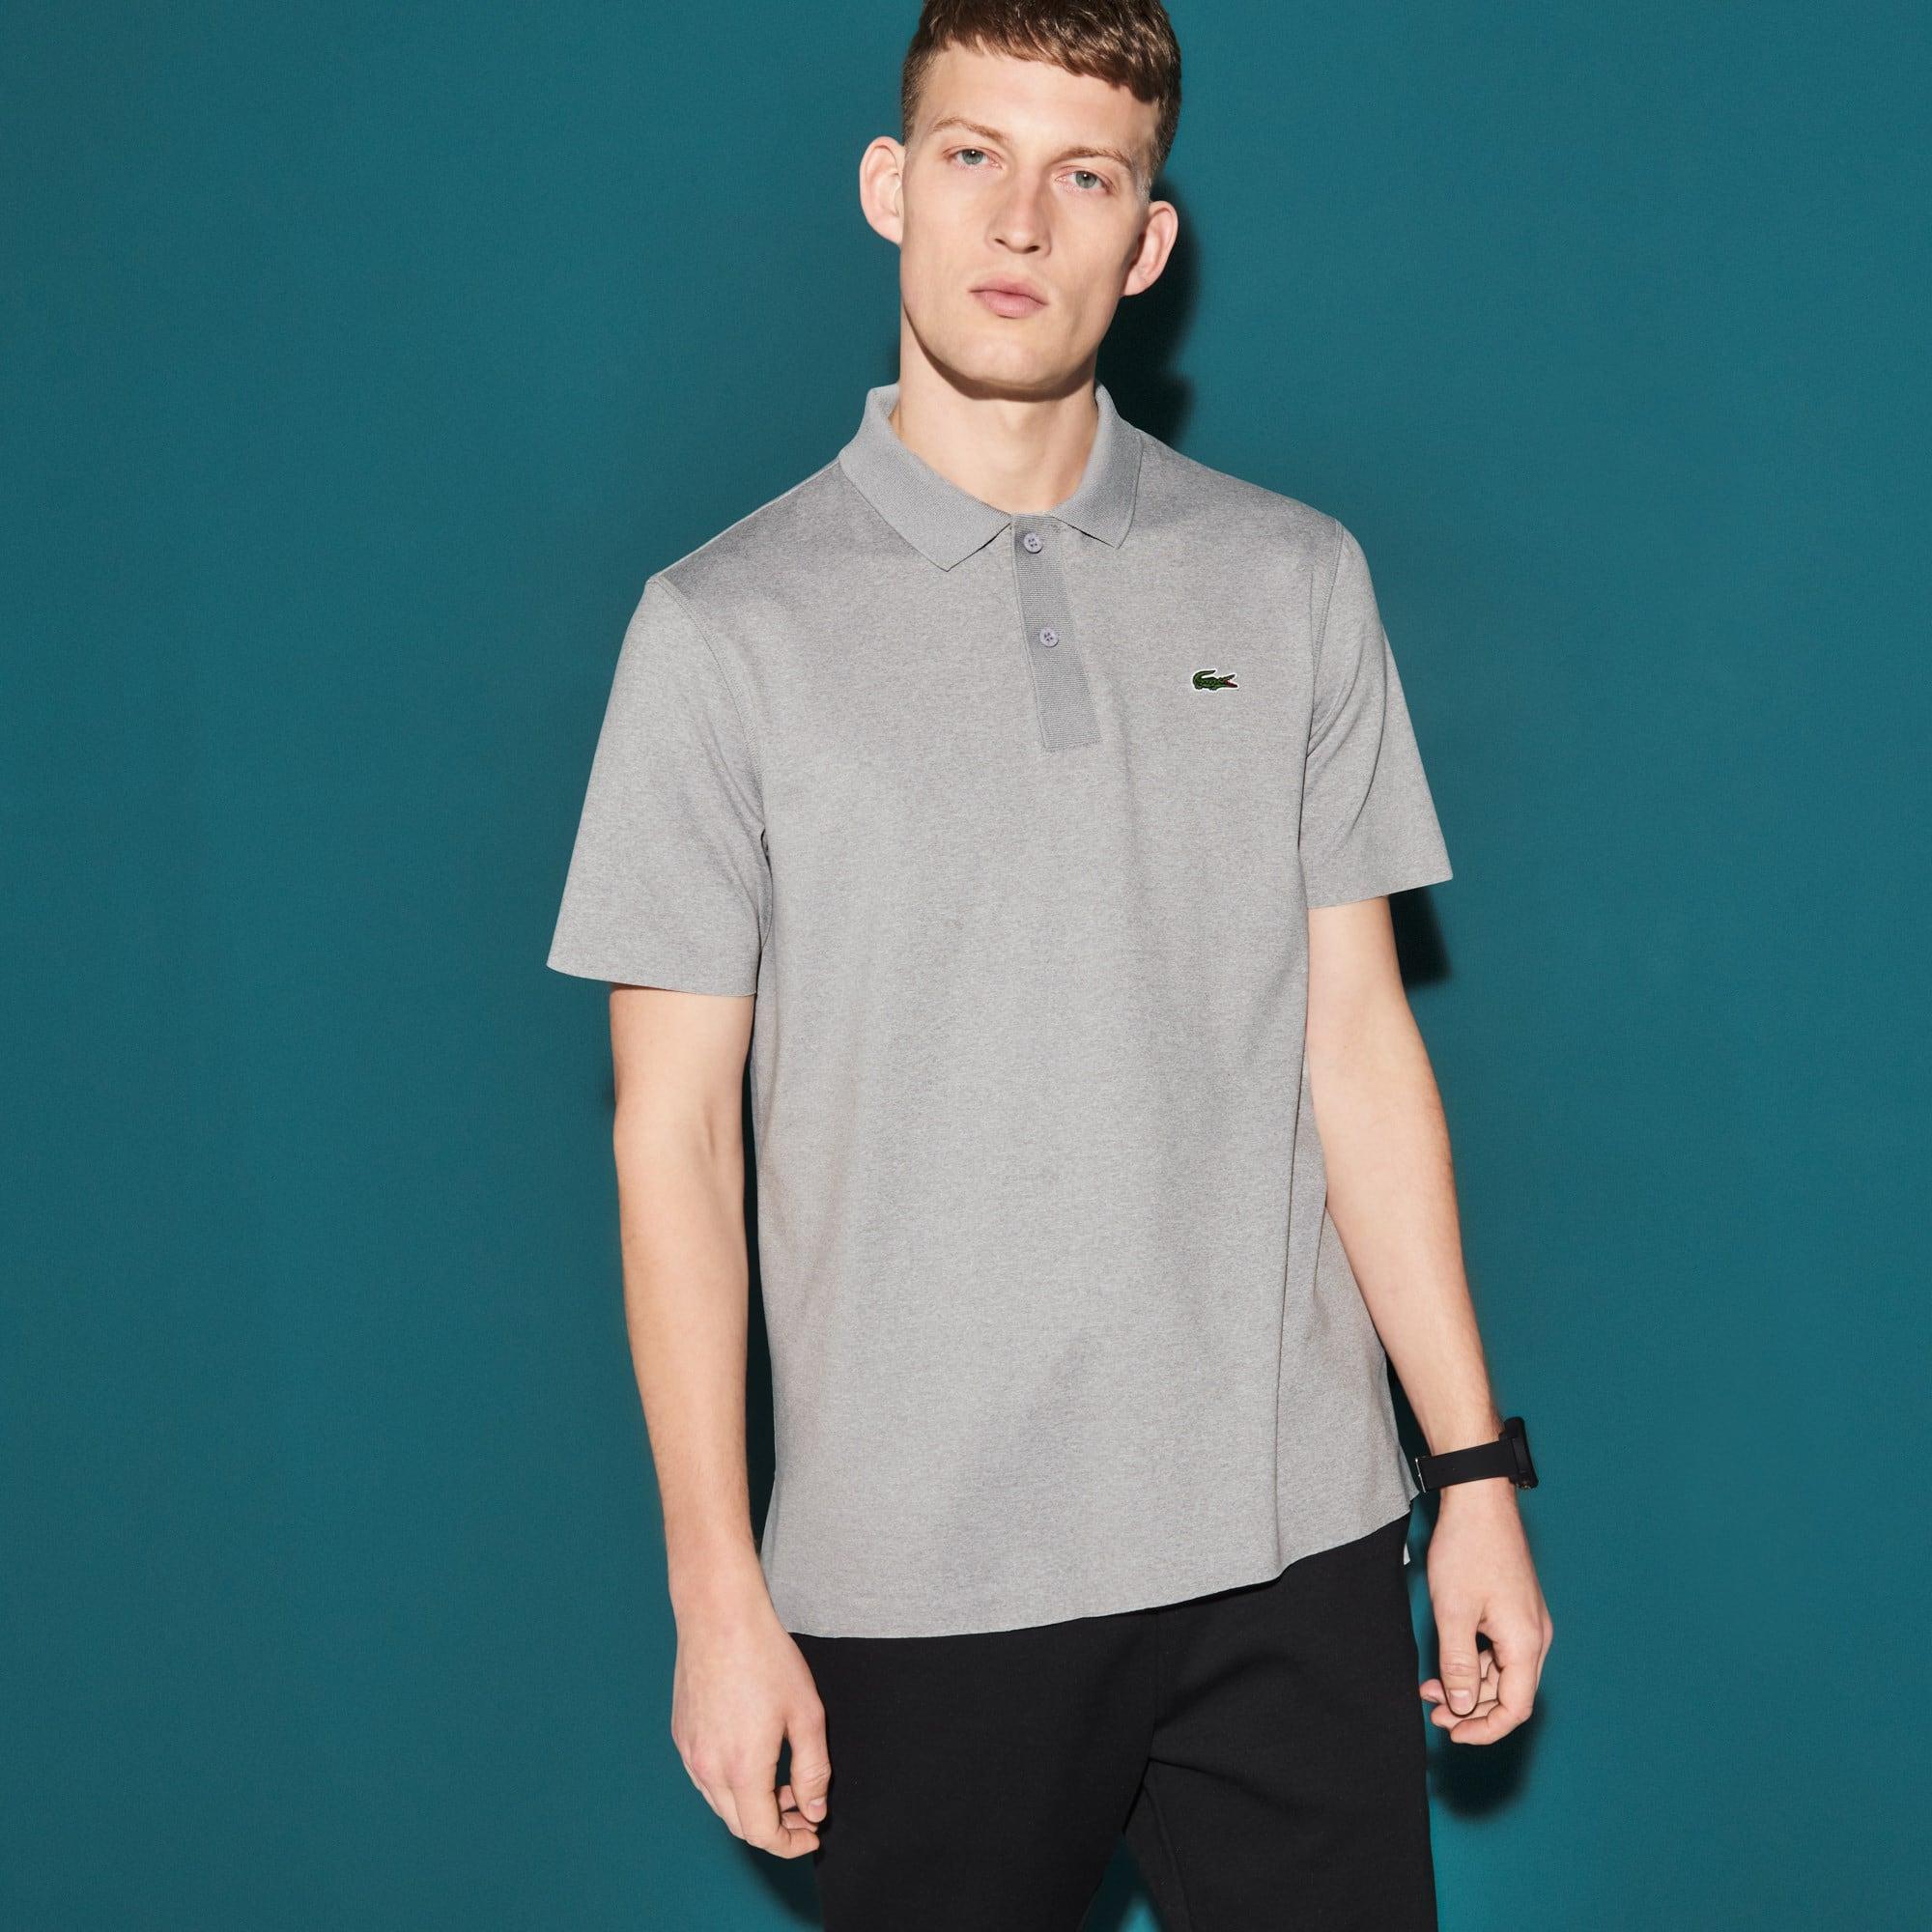 Camisas polo para homens, manga longa e manga curta   LACOSTE 41682dd2ce